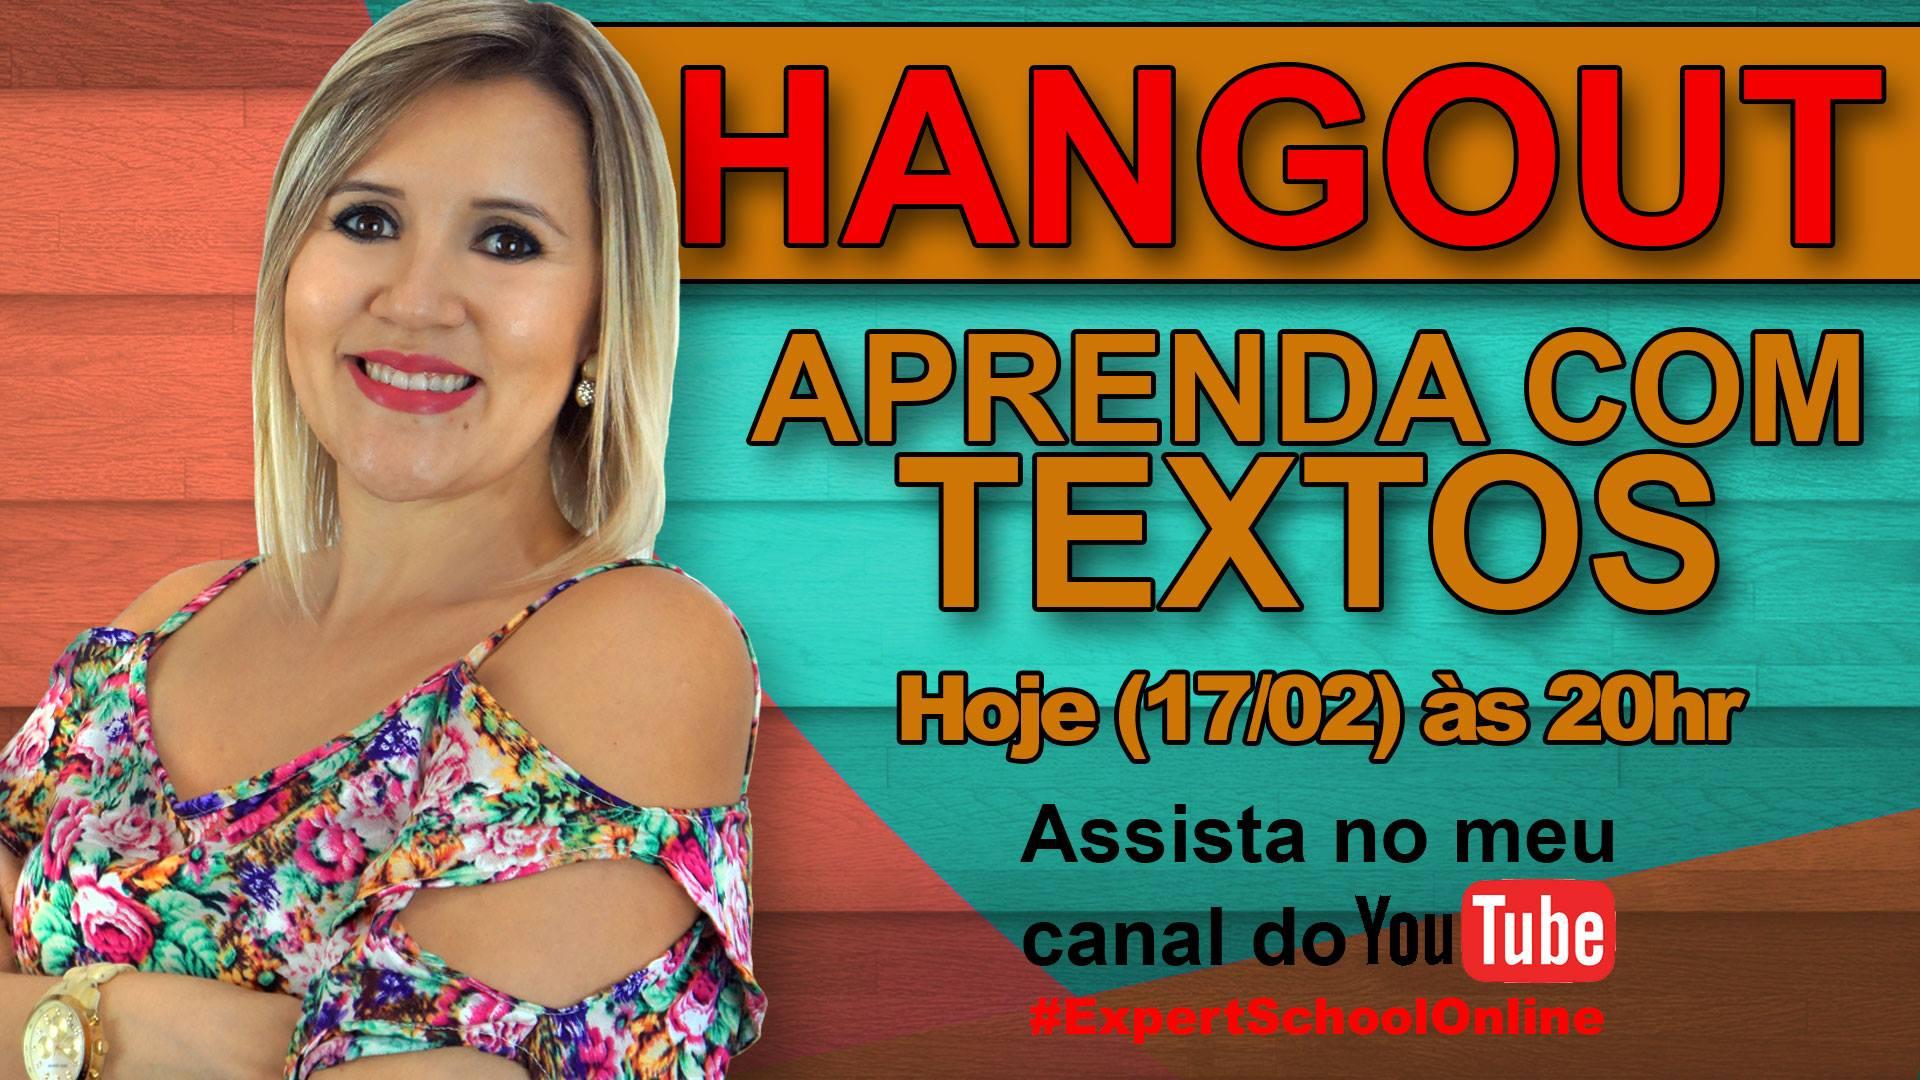 12751837_10209097953152498_372041216_o